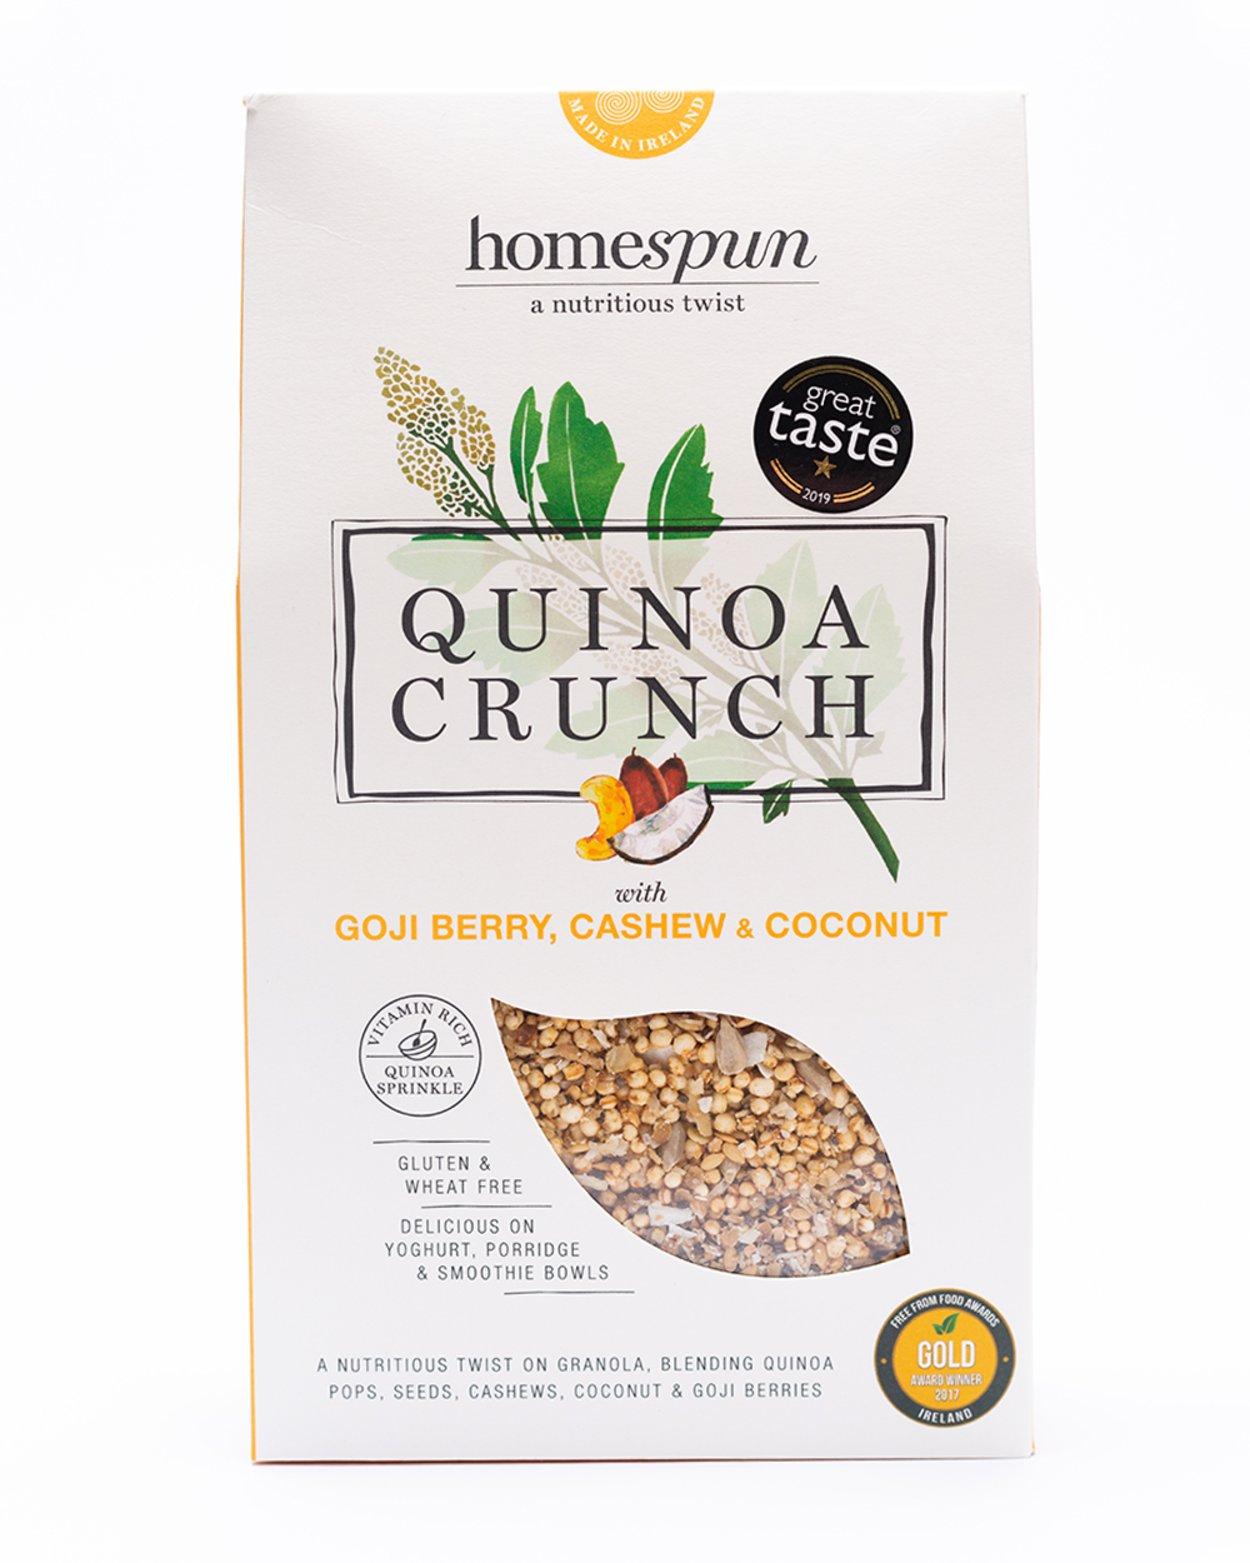 Homespun Goji Berry Quinoa Crunch